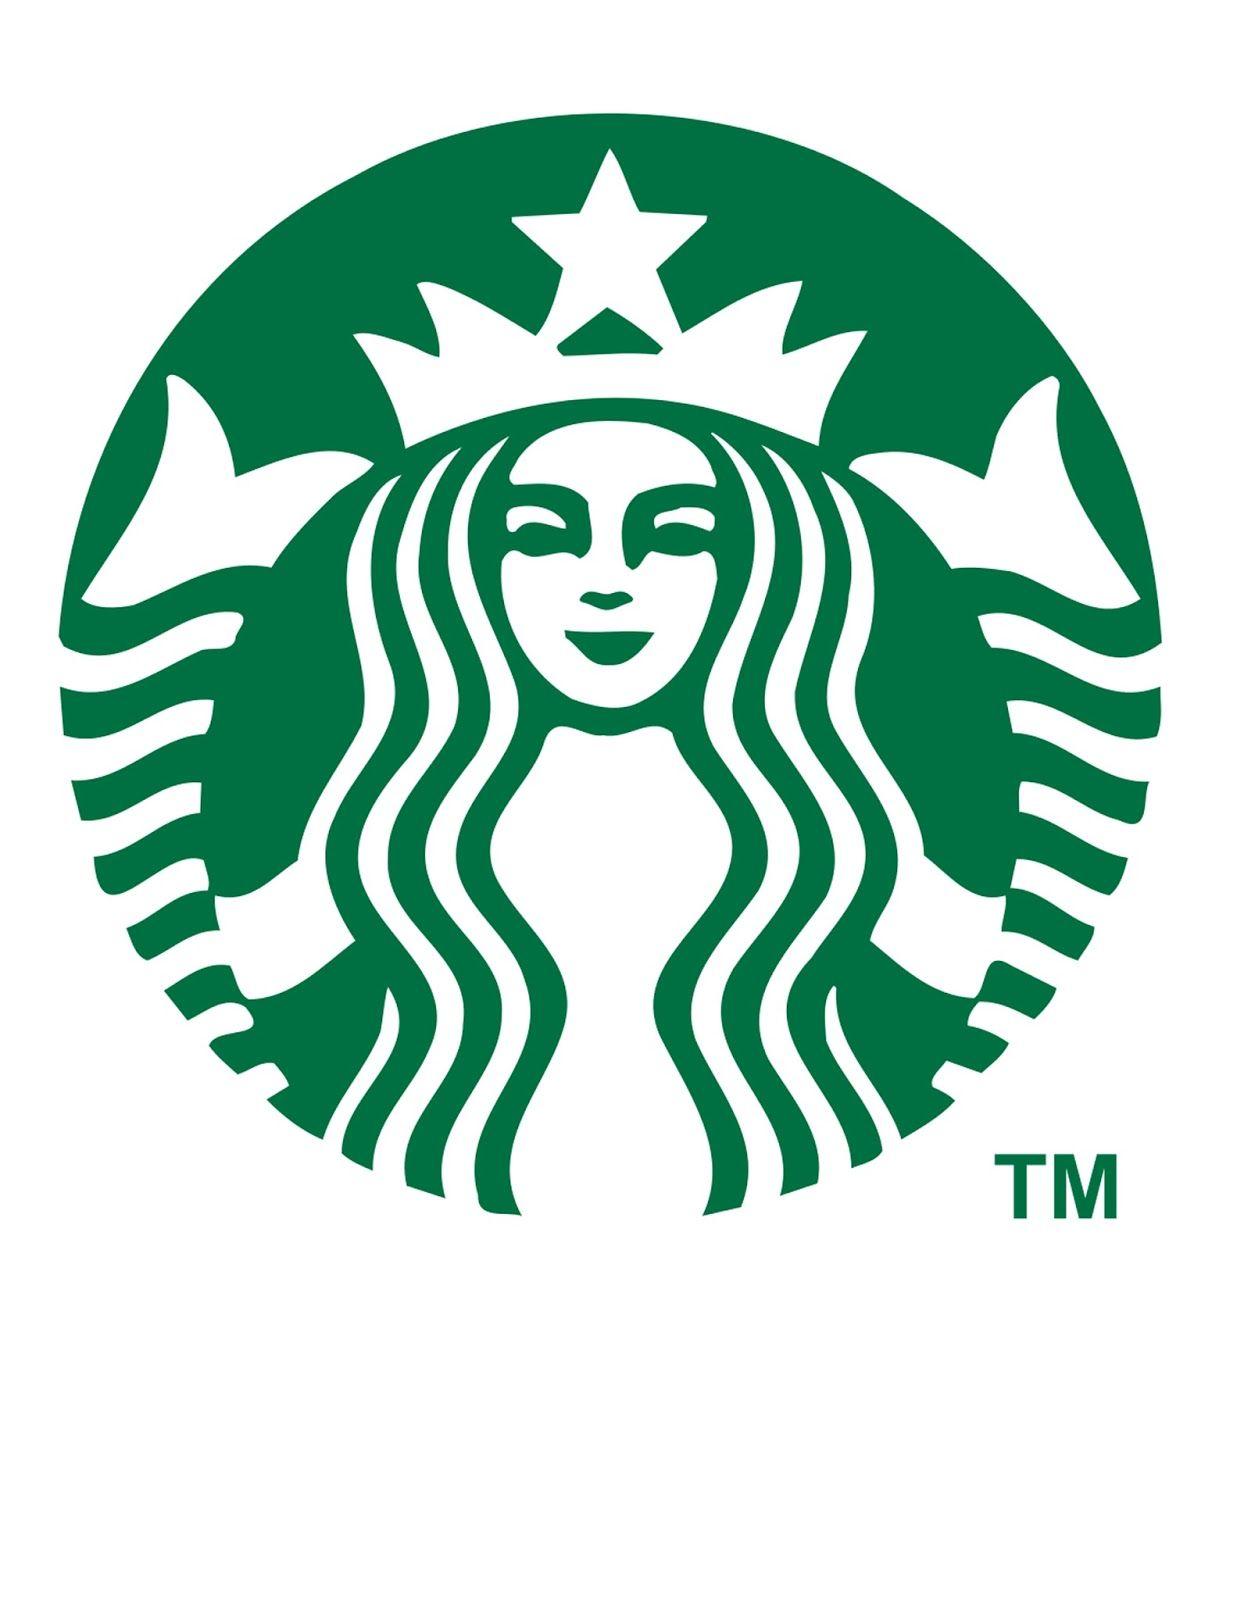 Starbucks logo Starbucks logo, Starbucks costume, Starbucks